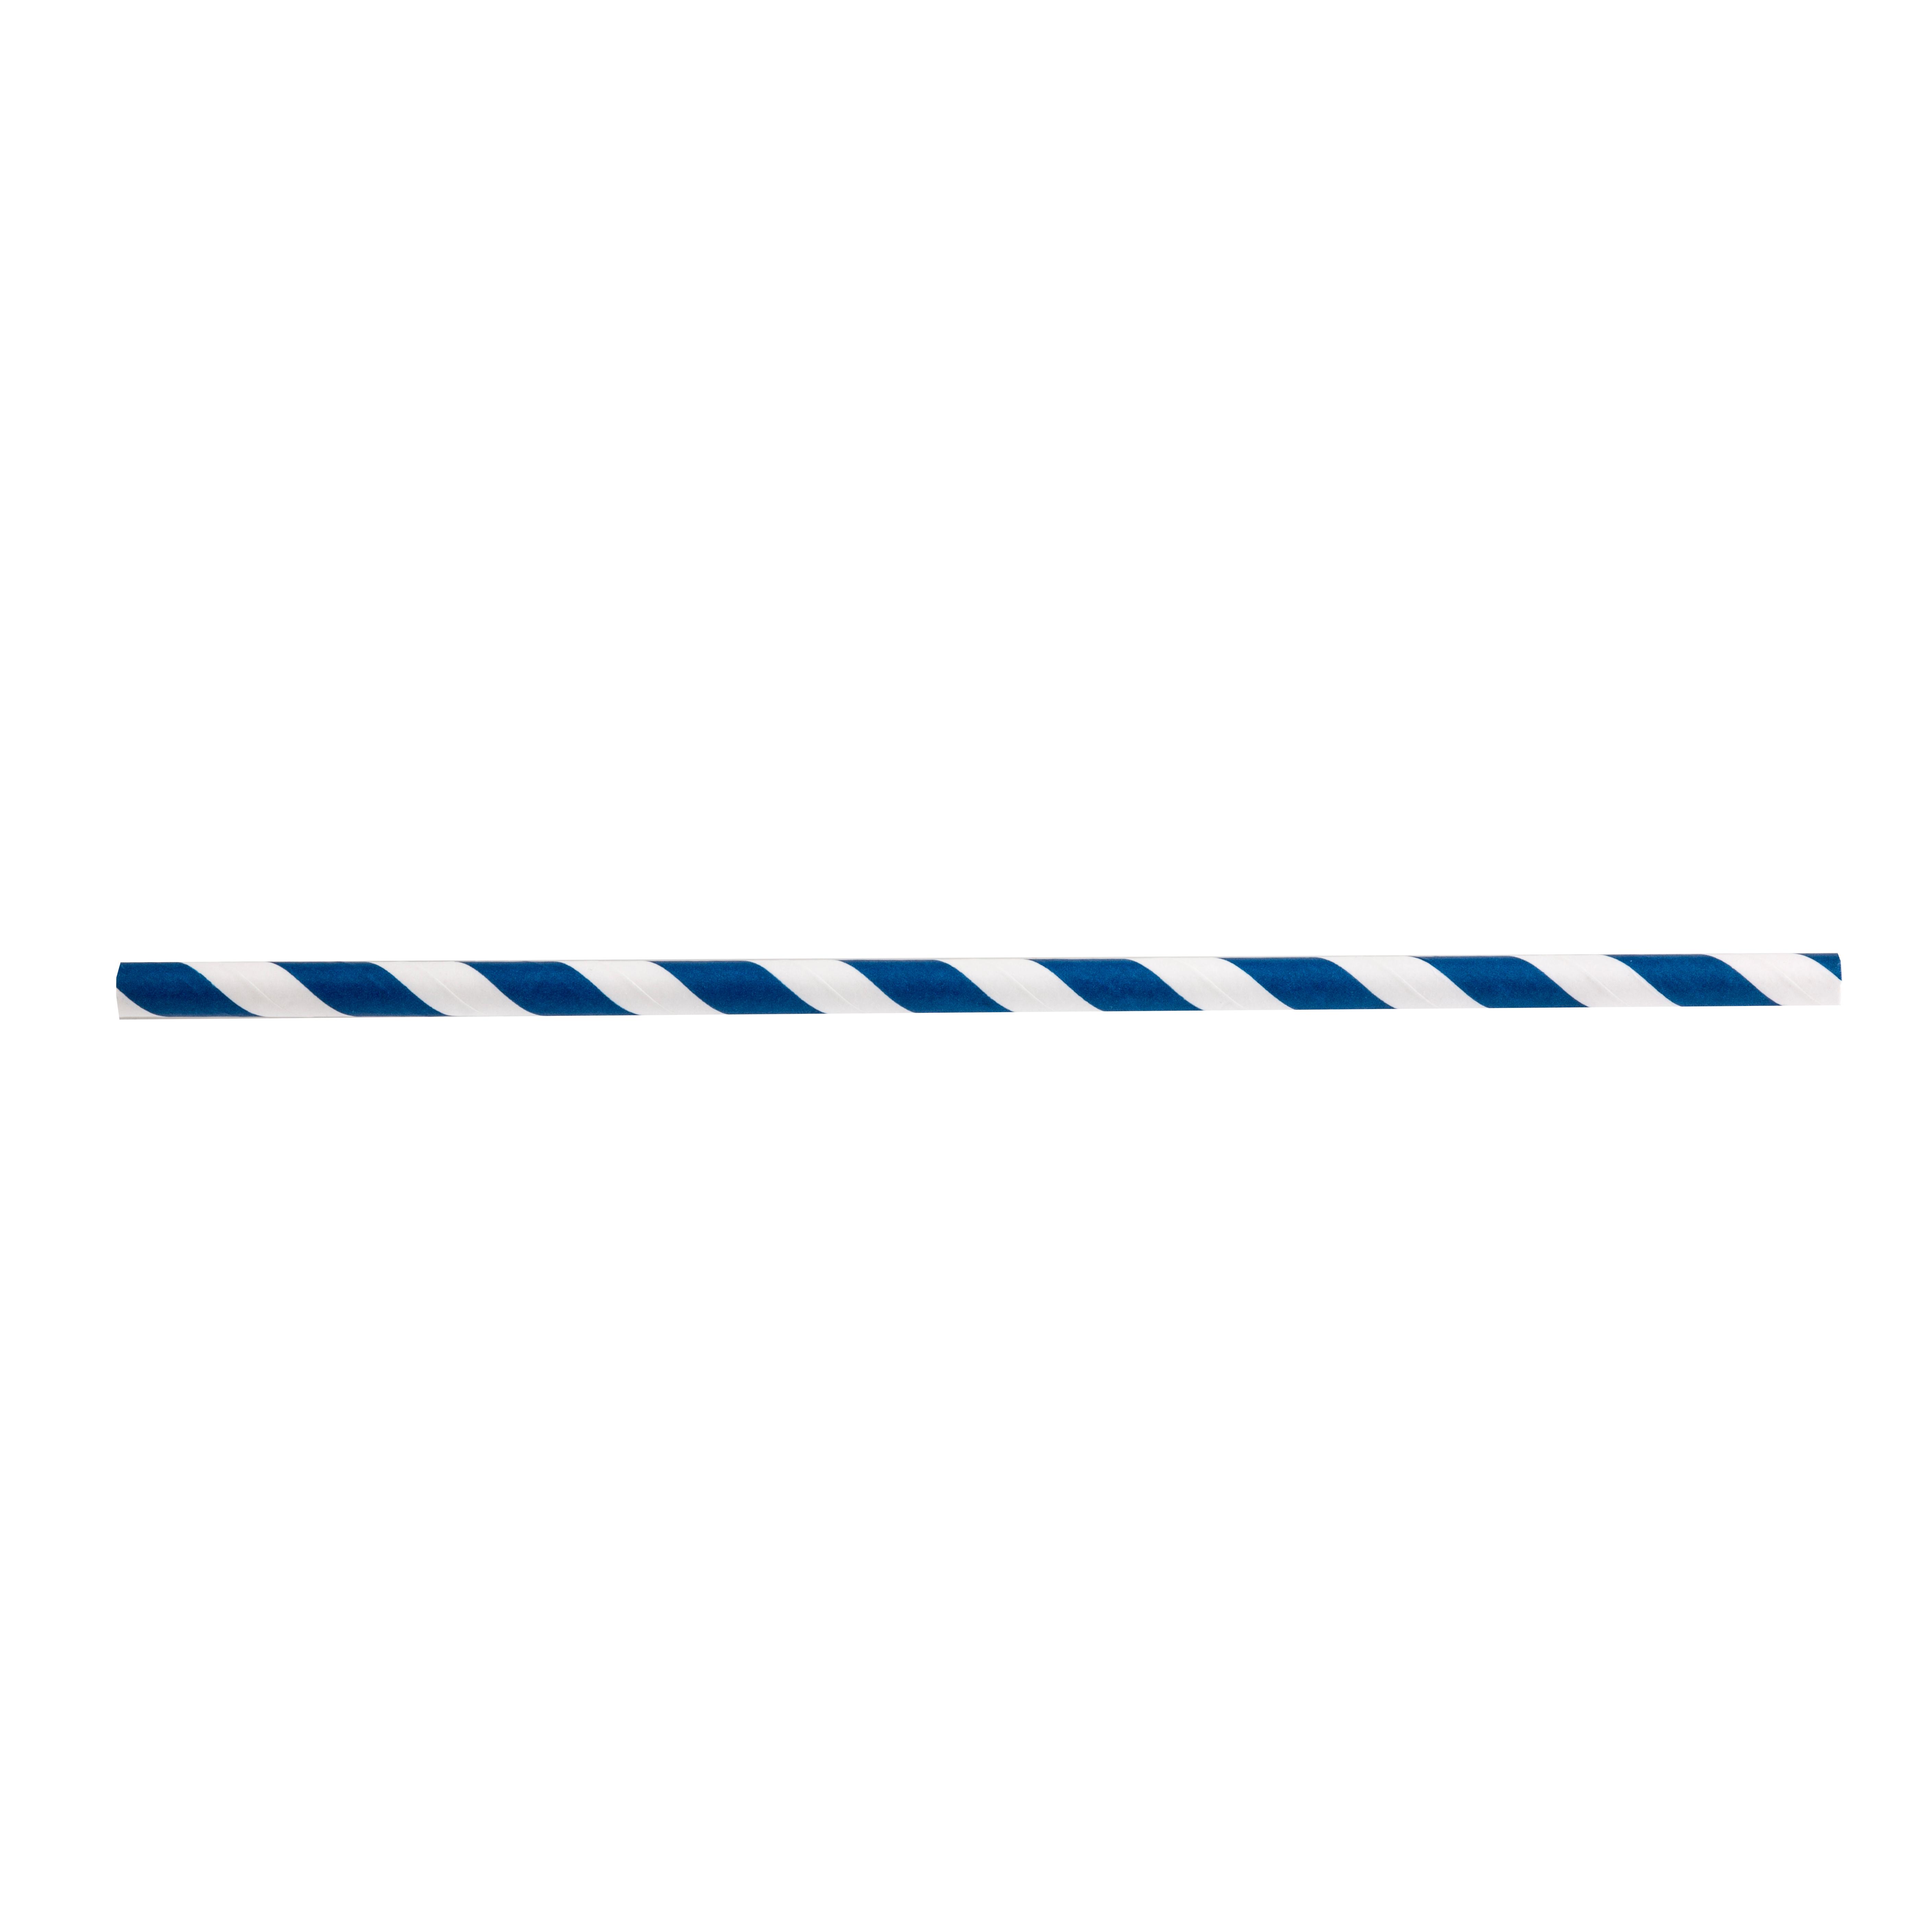 TableCraft Products 700121 straws